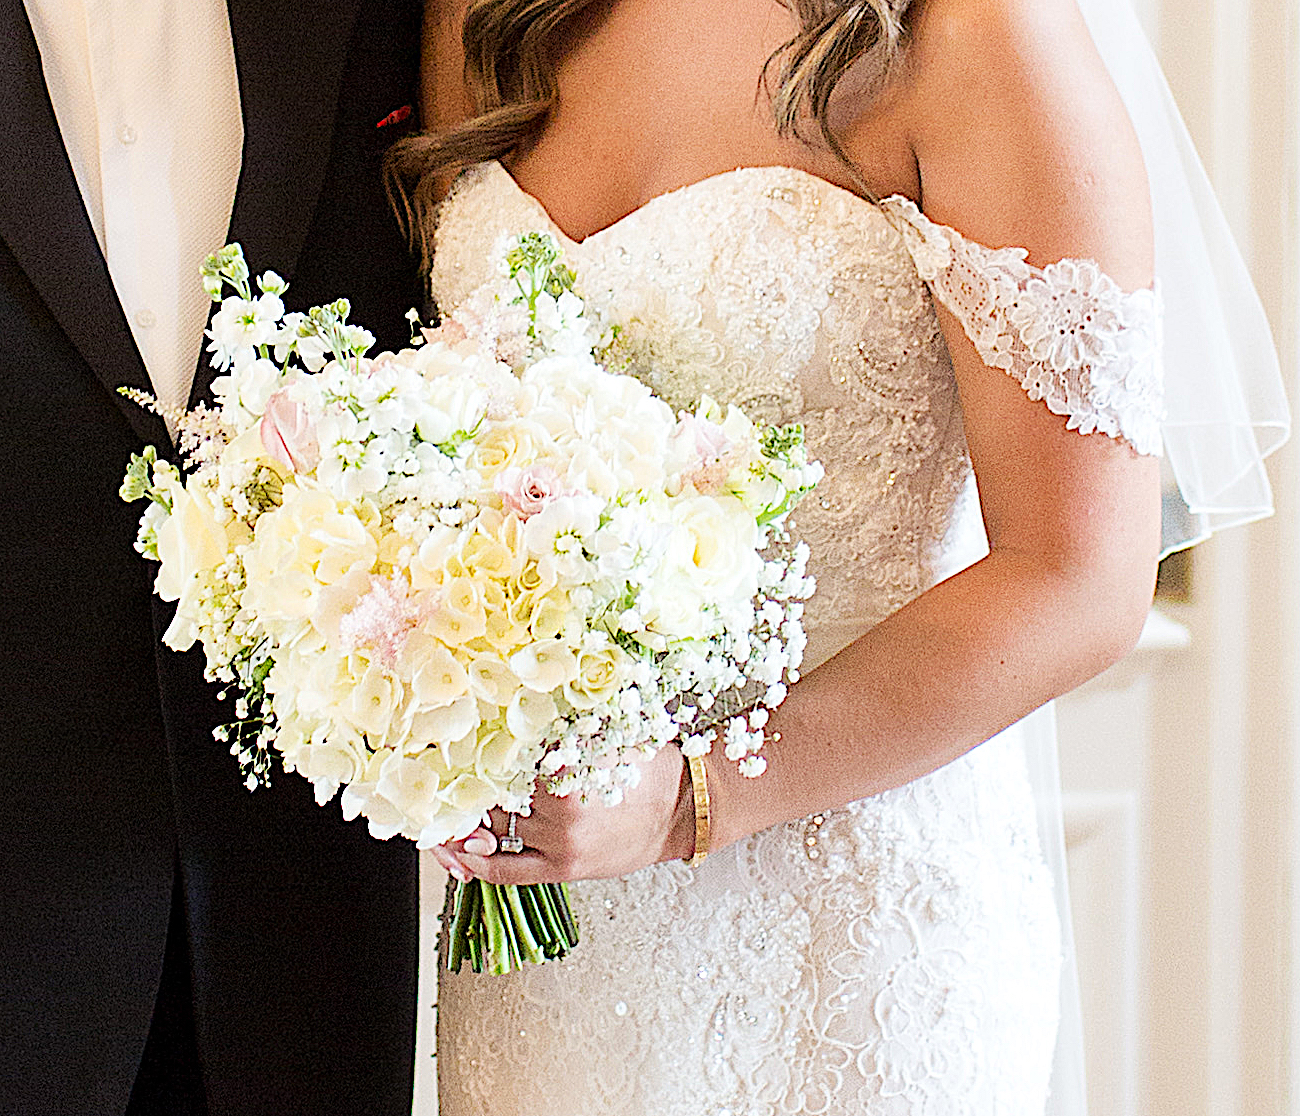 Ardington-house-wedding-ilaria-petrucci-photography-sophie-and-david-190 copy